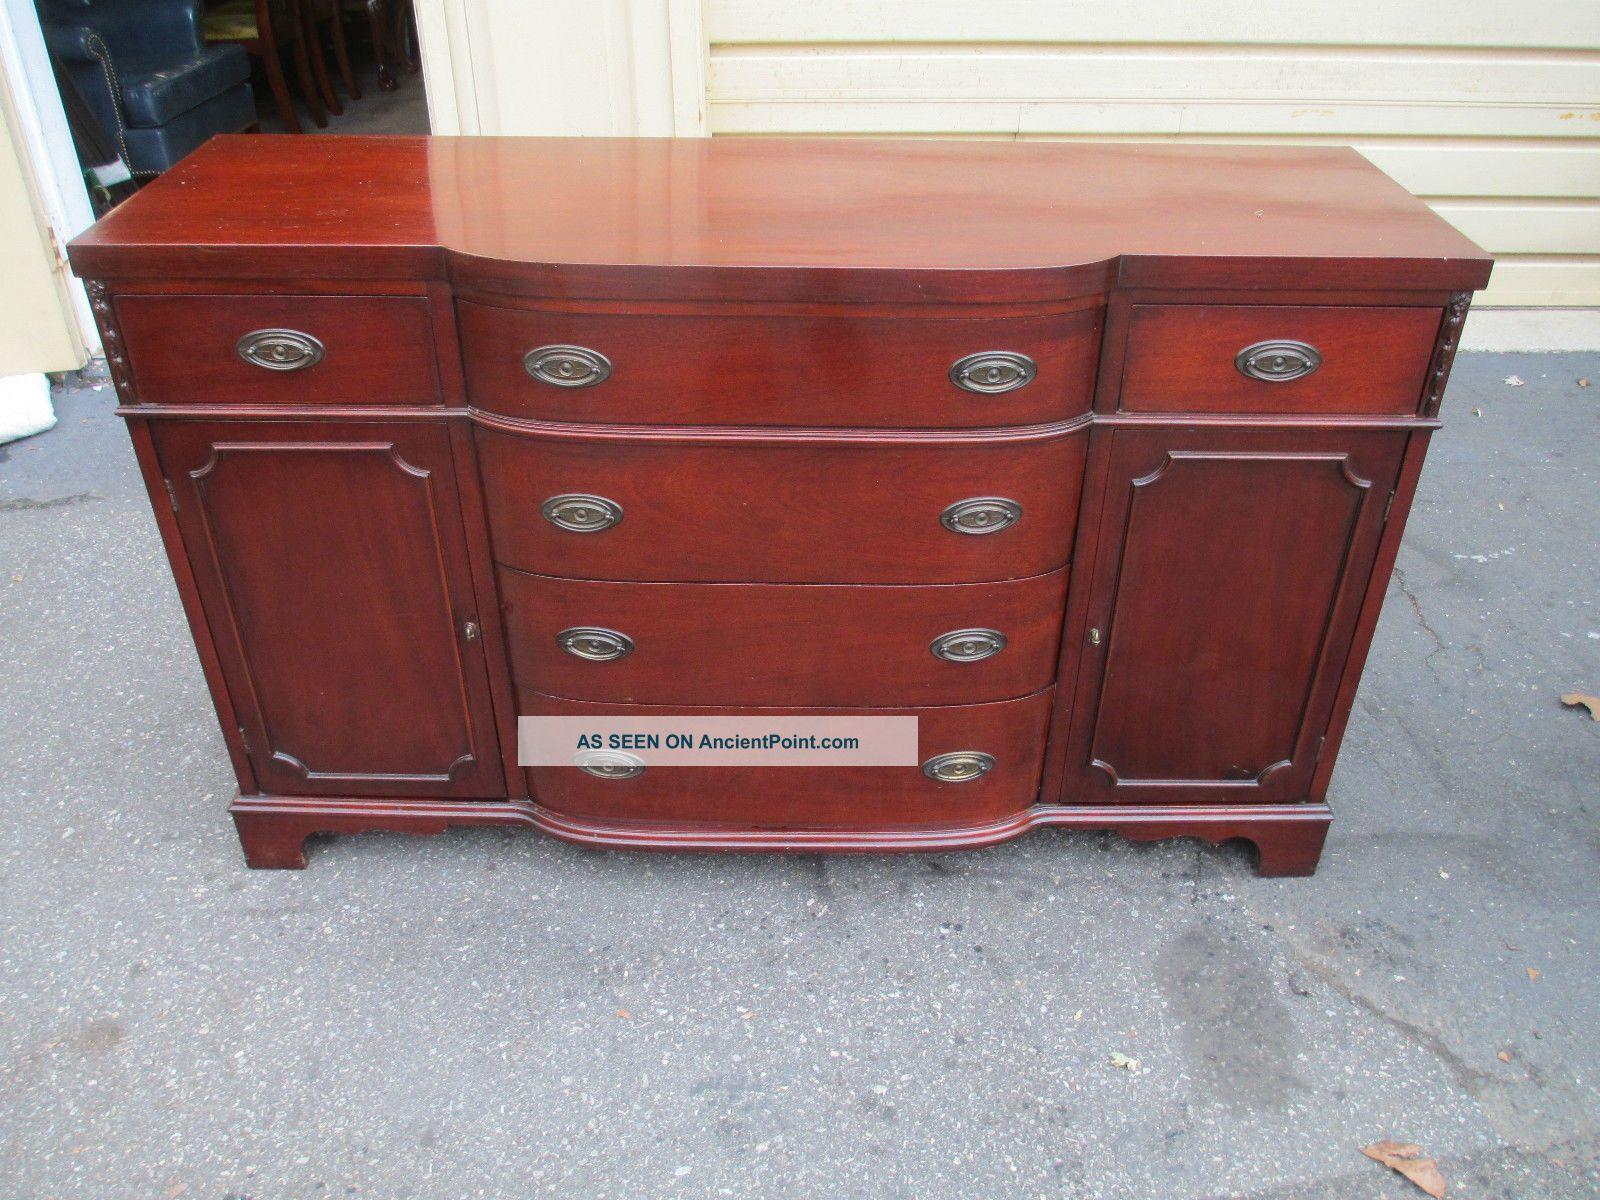 52160 Antique Mahogany Buffet Sideboard Server 1900-1950 photo